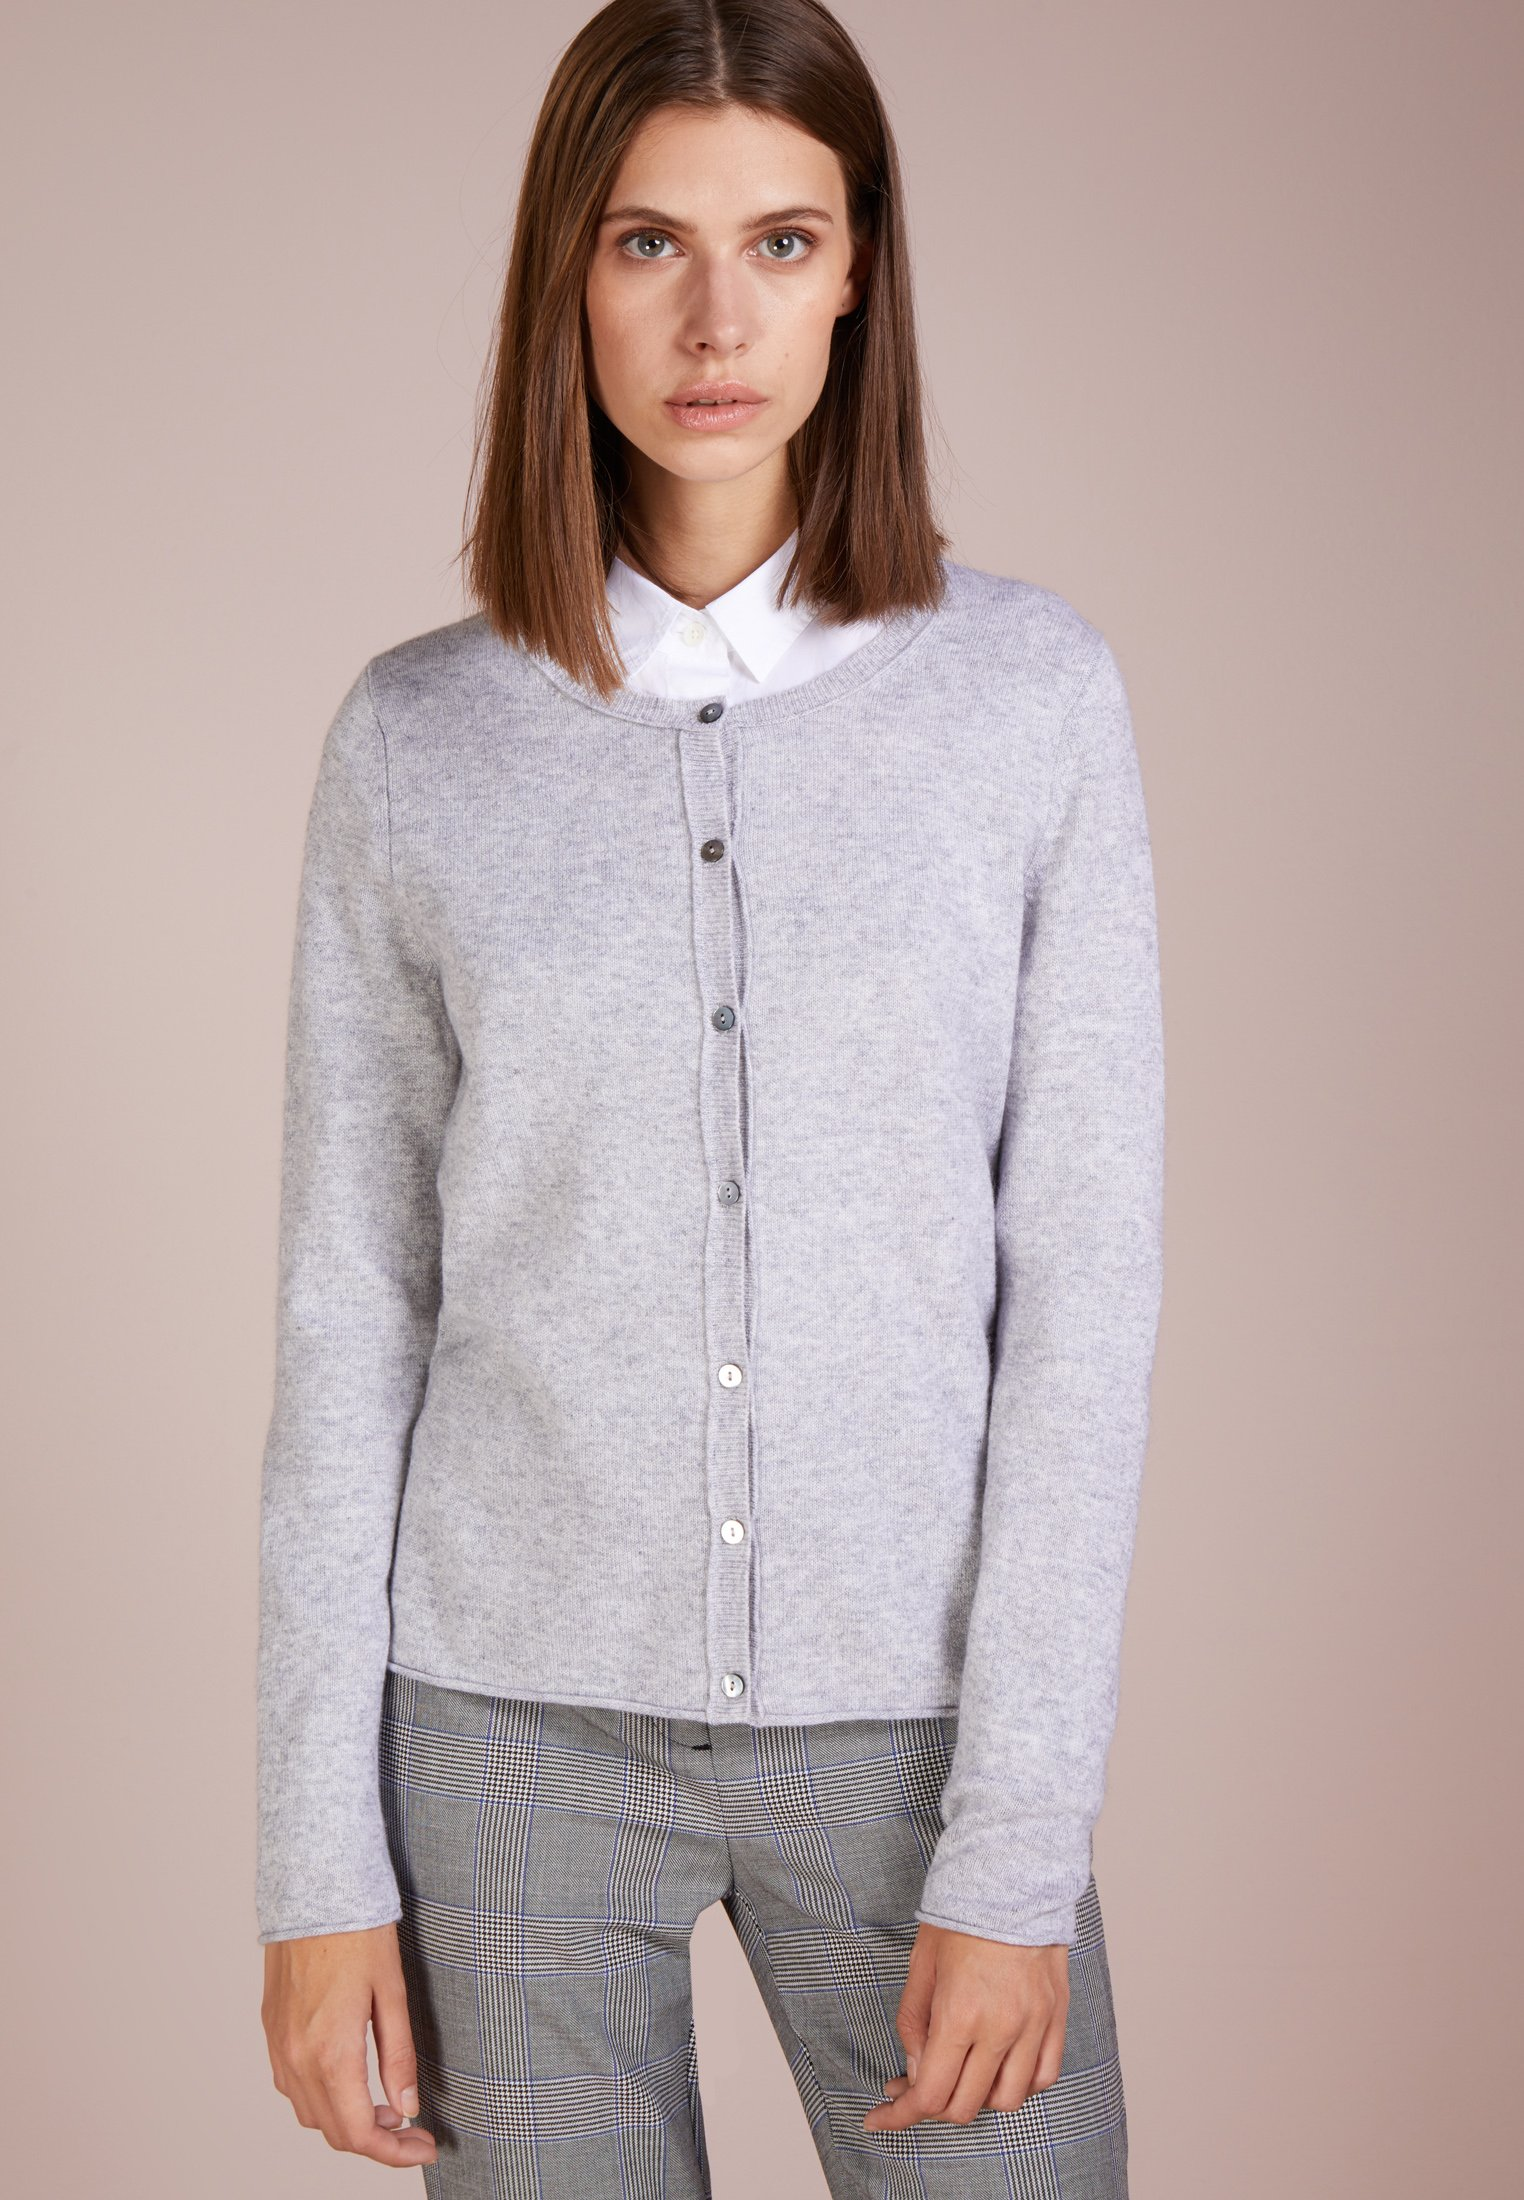 FTC Cashmere CARDIGAN - Vest - grey - Dames jas Aanbod